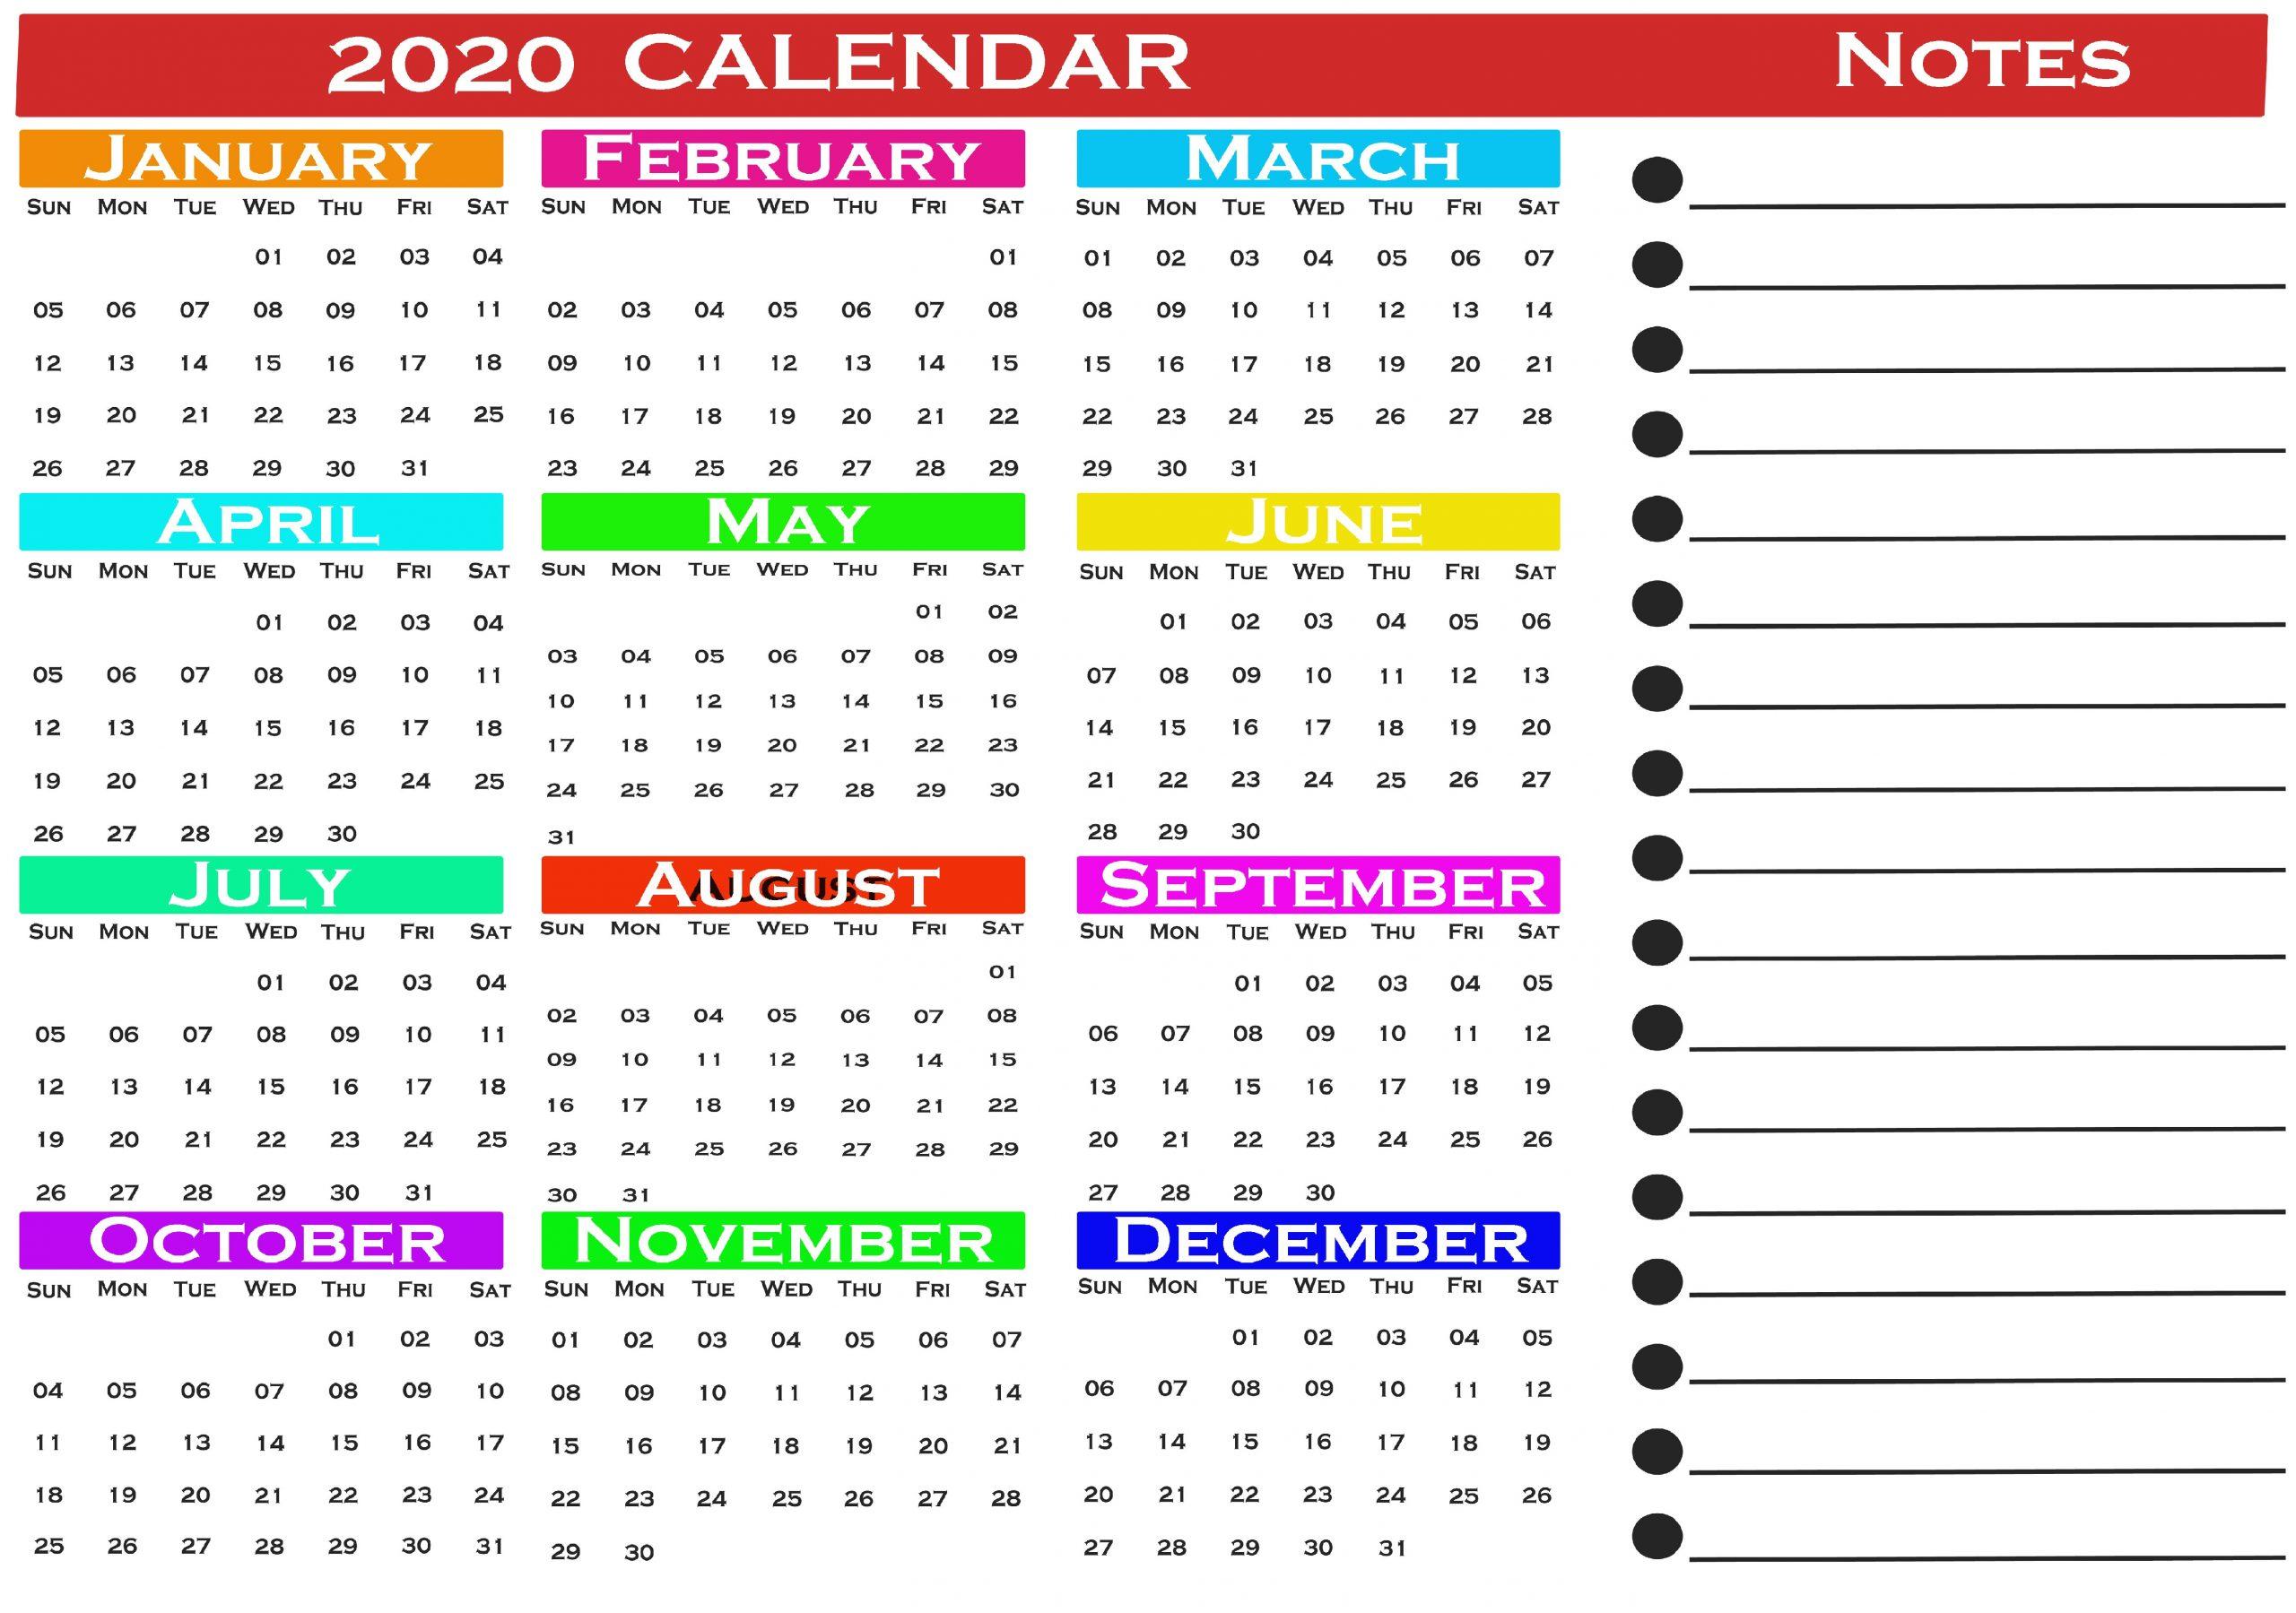 2020 Calendar- Free Printable 2020 Calendar Pdf- Jan To Dec